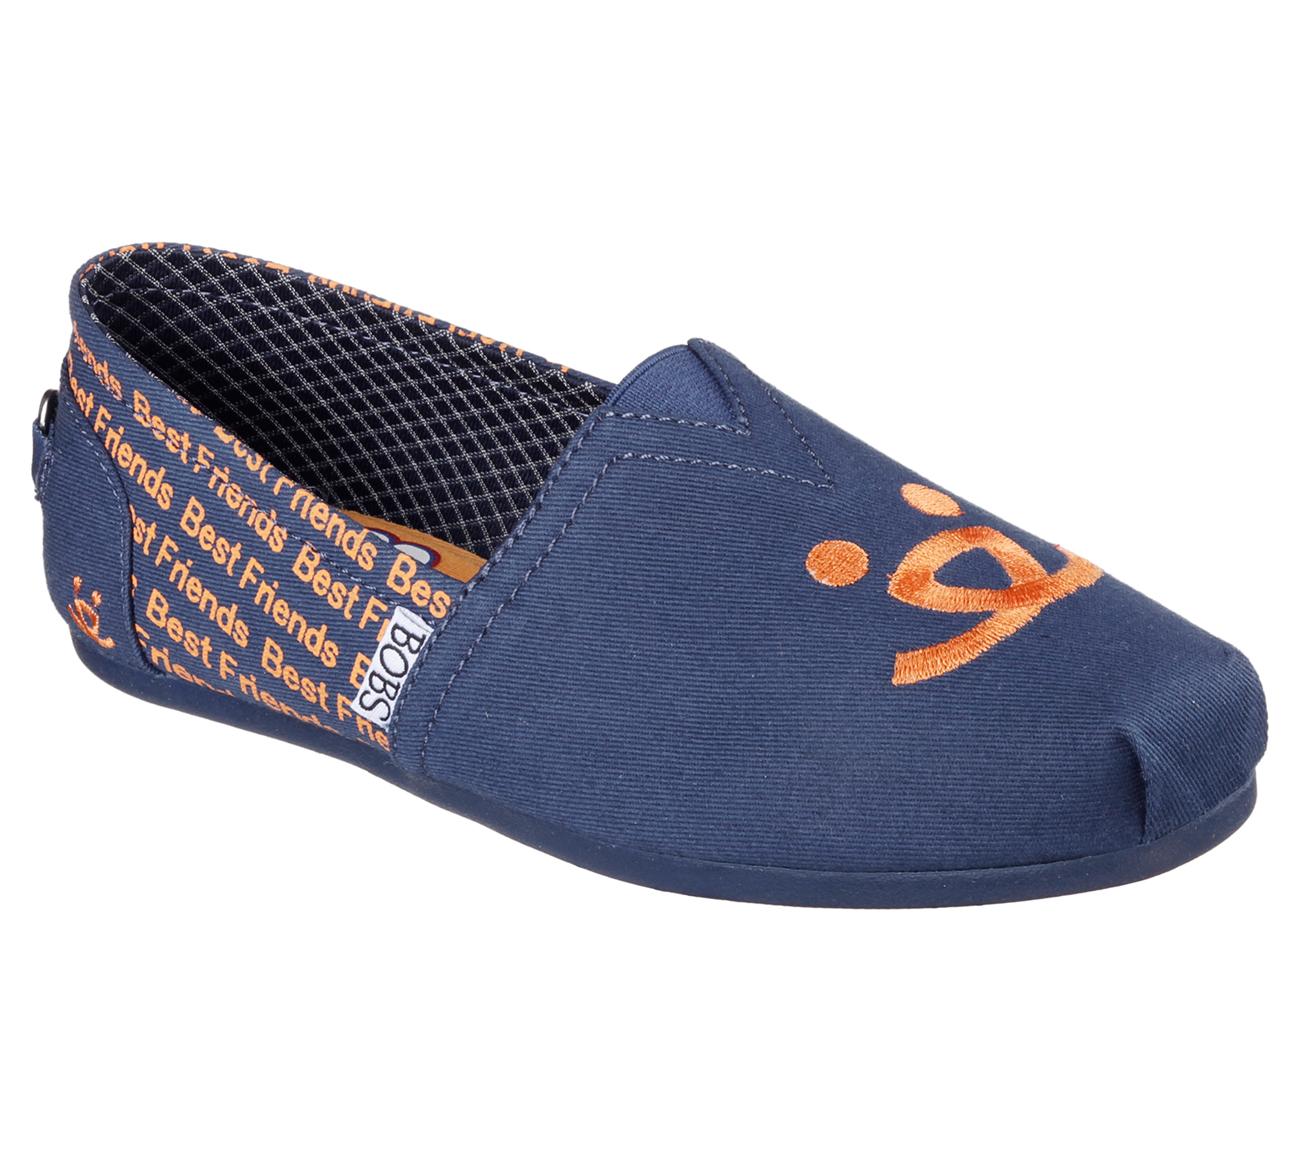 skechers bobs plush friends shoes dogs them bob navy shoe animal memory slip comfort foam soft nvy sold